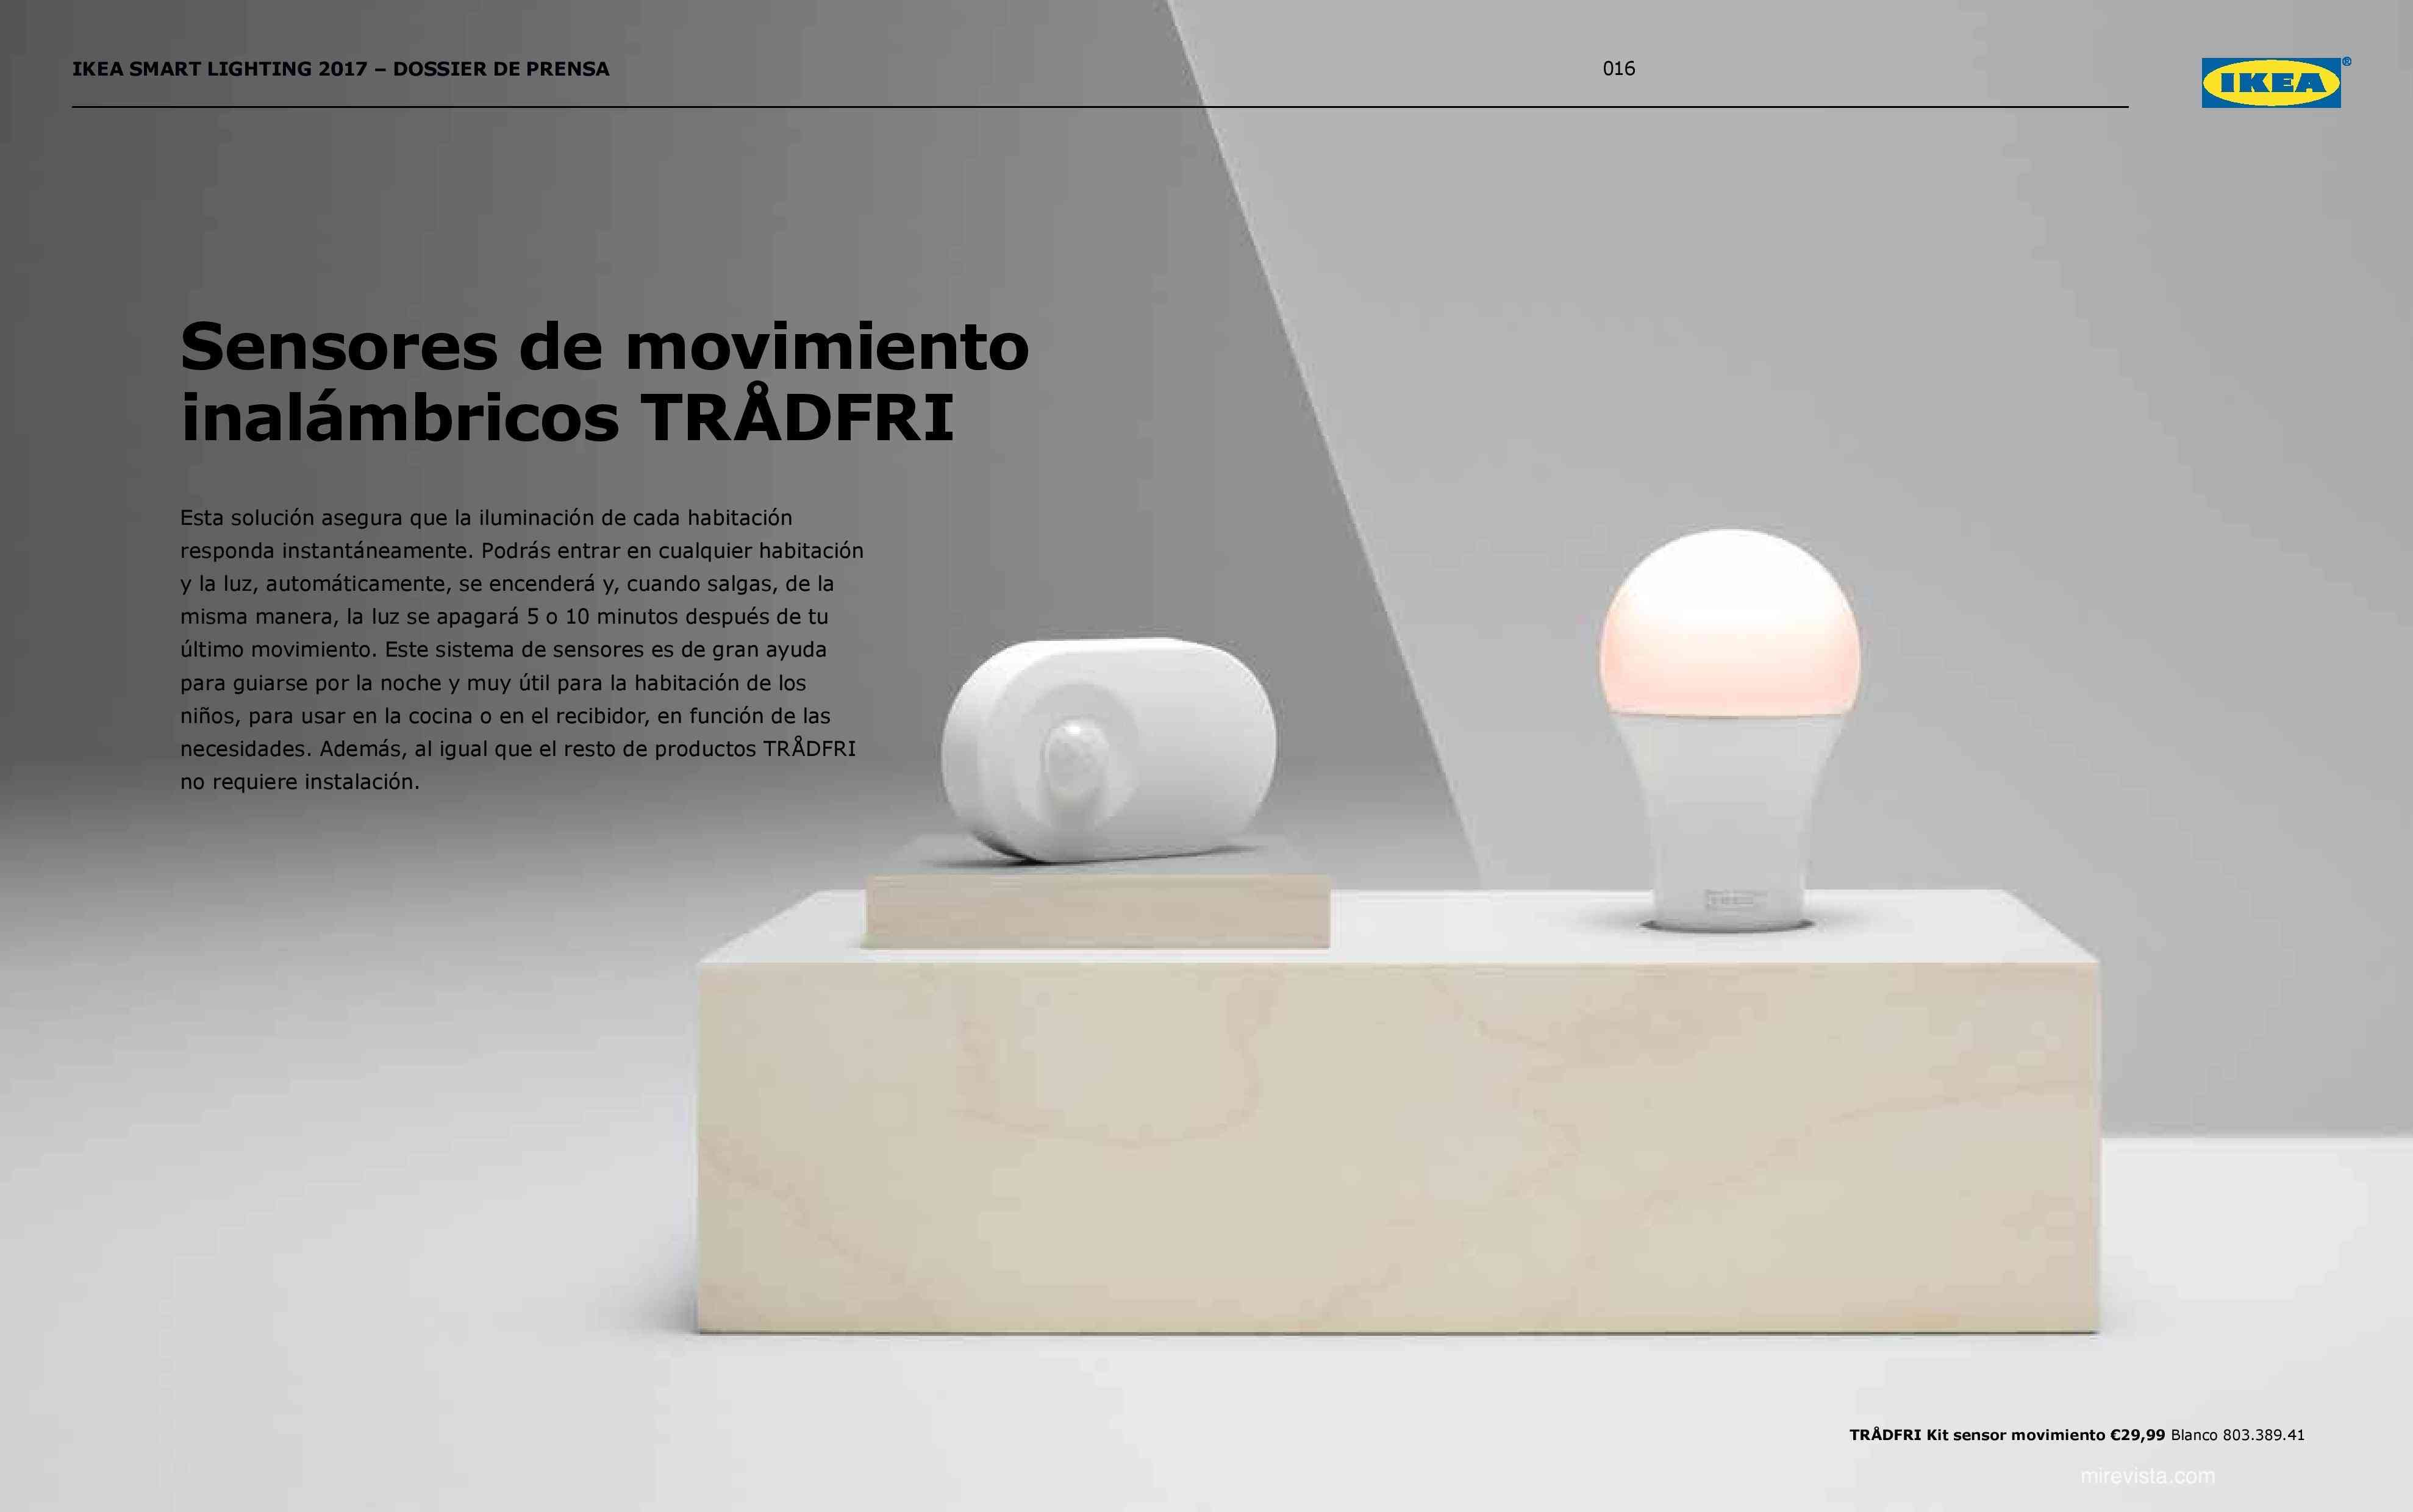 Novedades en iluminación de casas inteligentes con IKEA 72